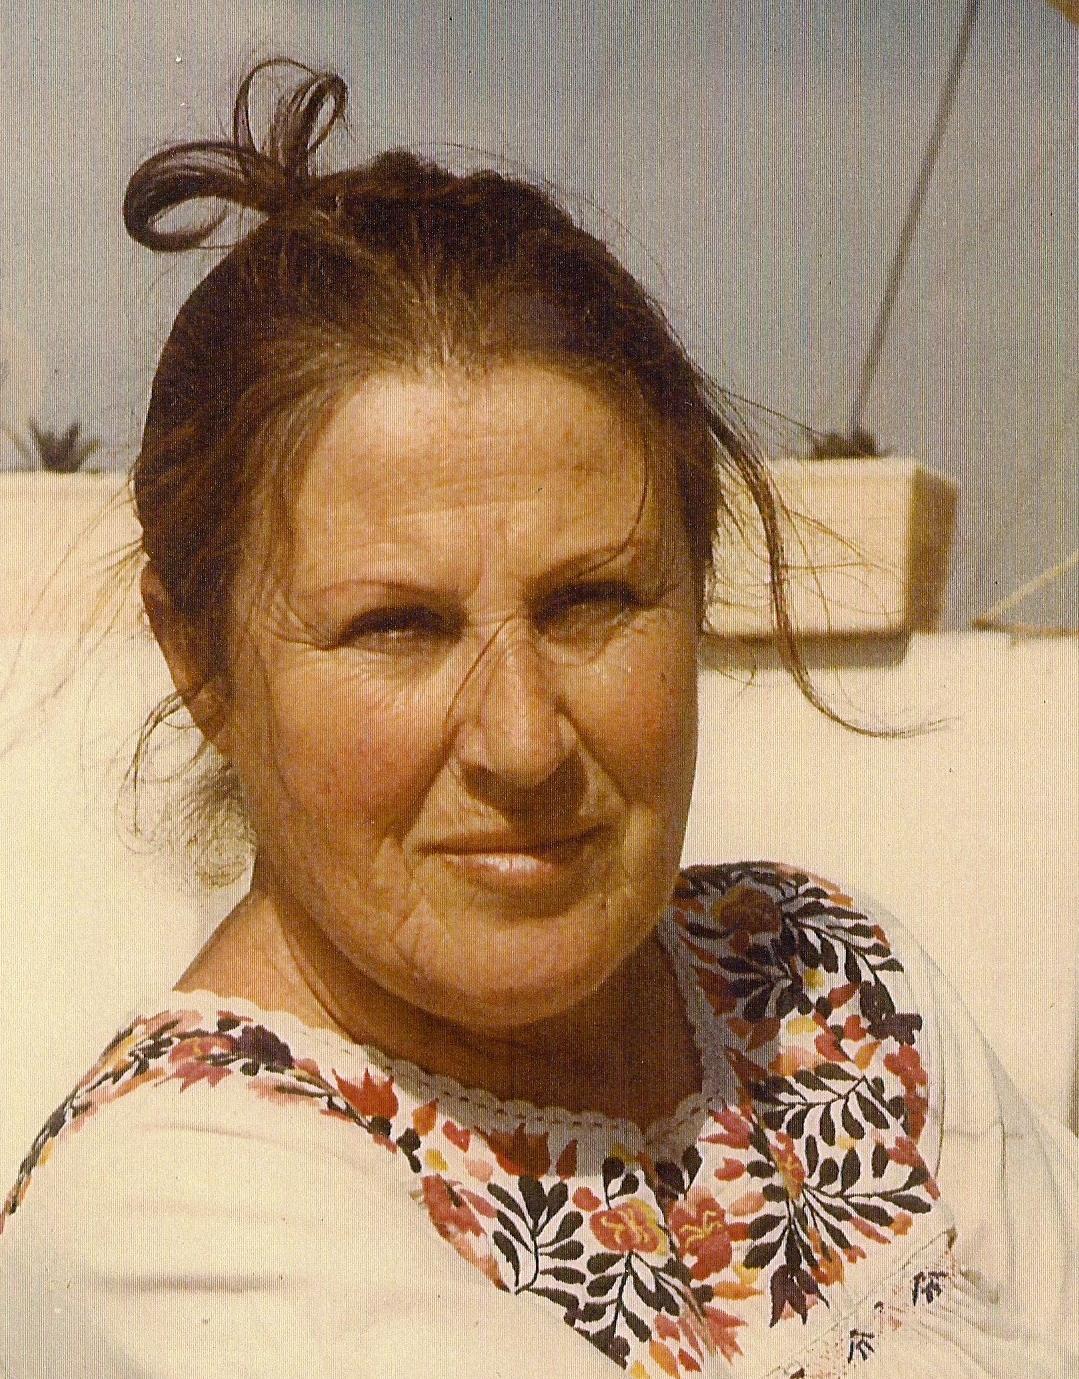 Ruth Zarfati